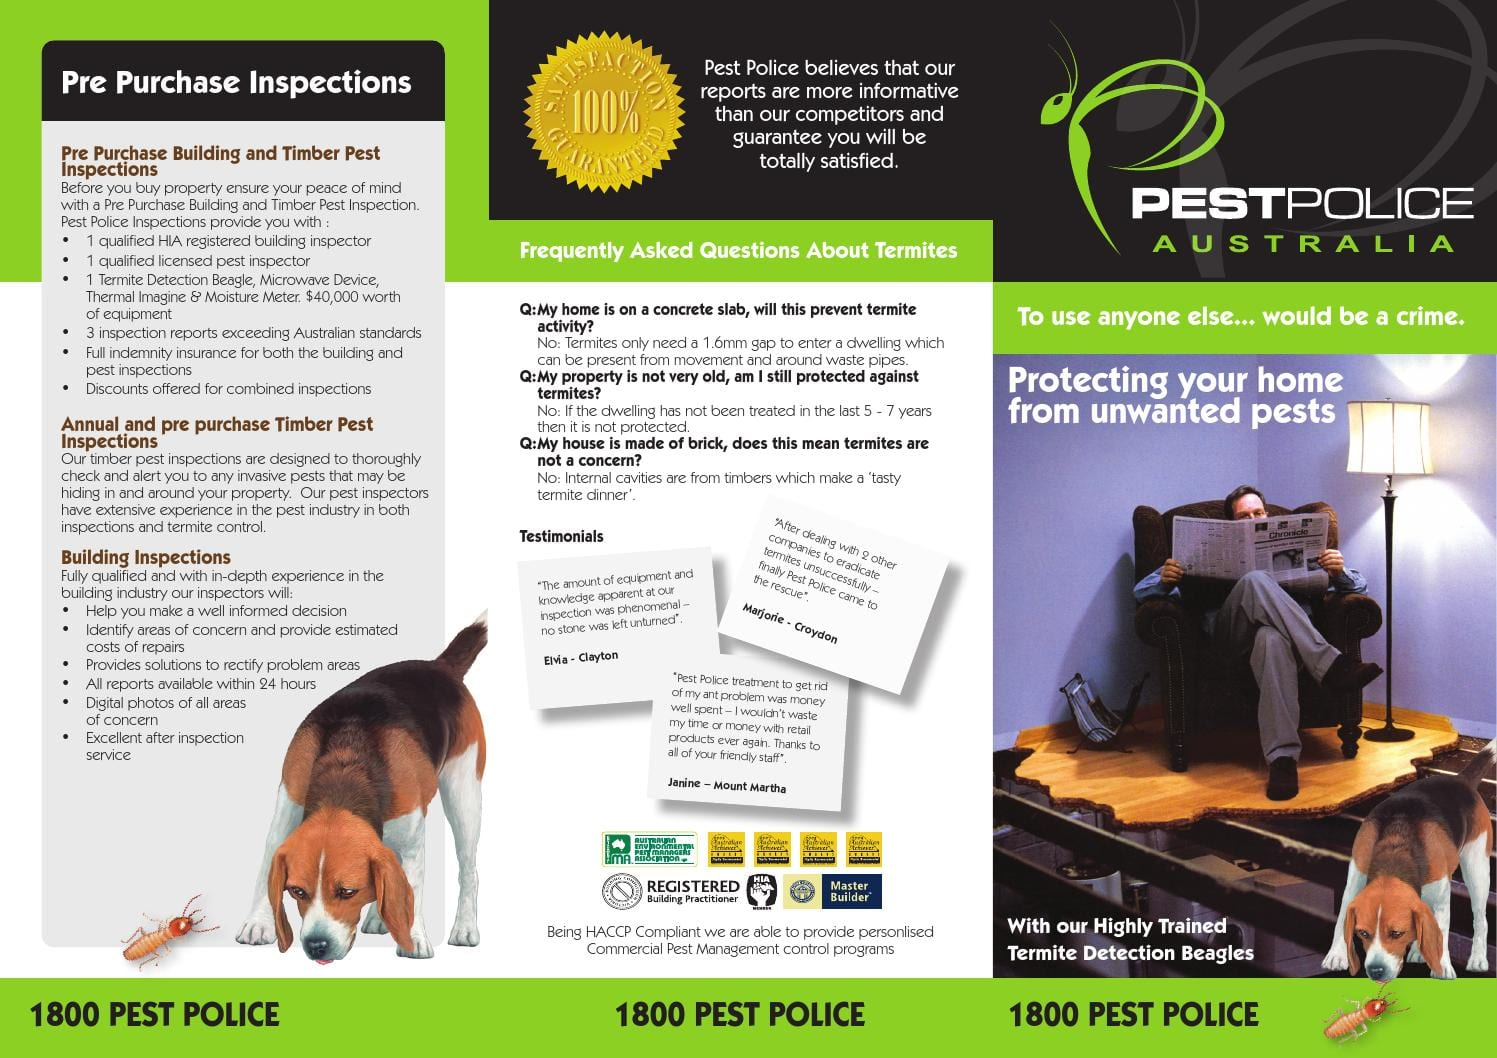 Termite Detection Dog Company dog trainer Australia